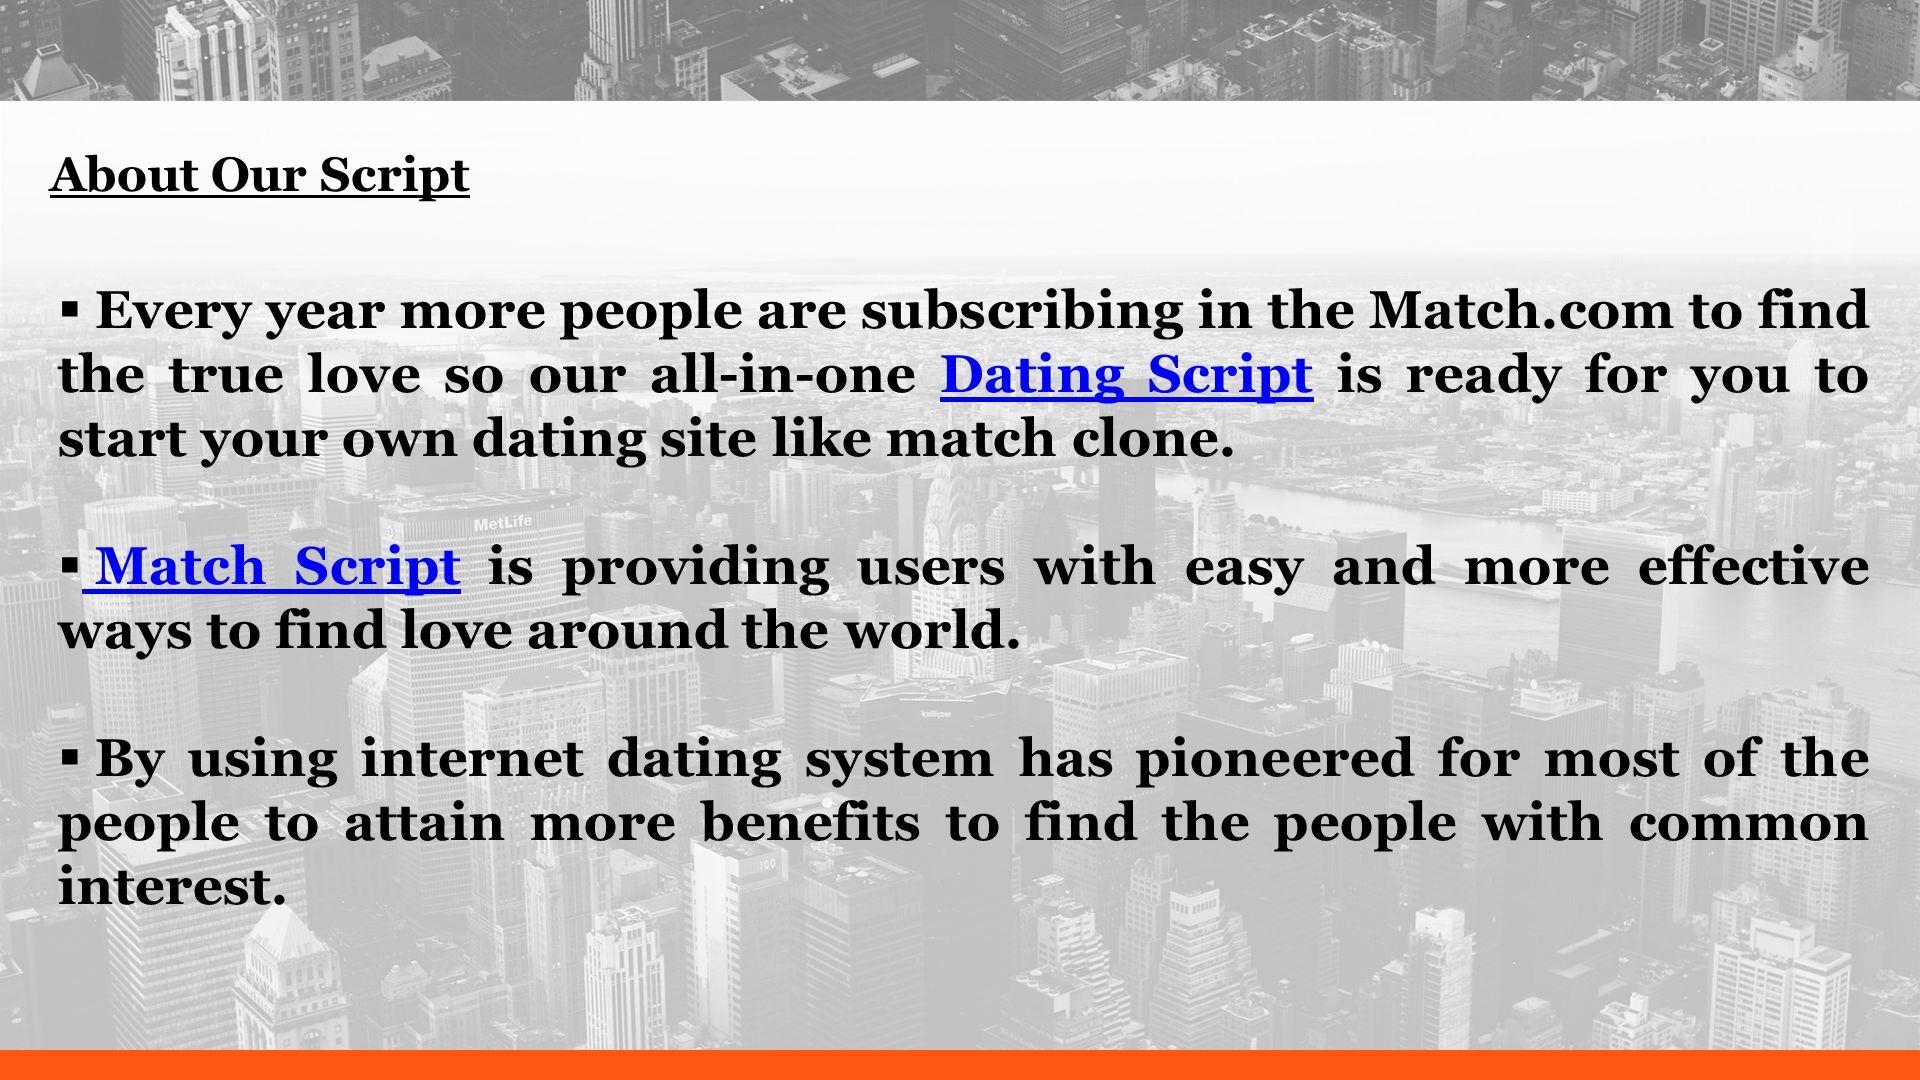 Internet dating providings